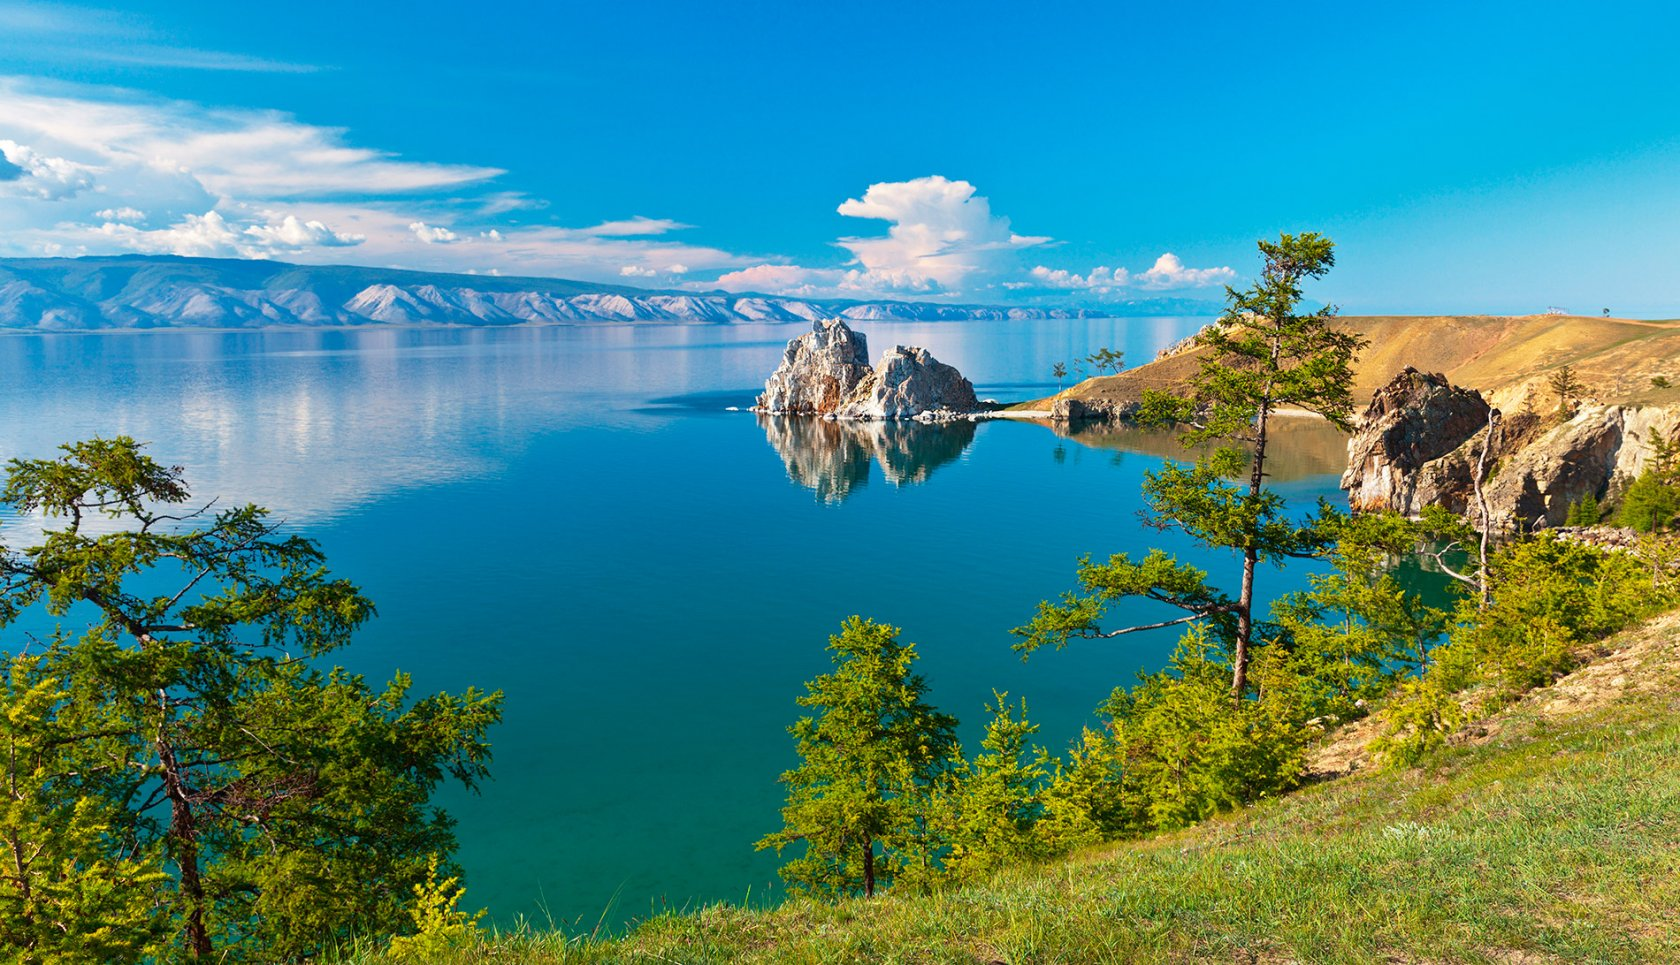 Знаменитое озеро Байкал